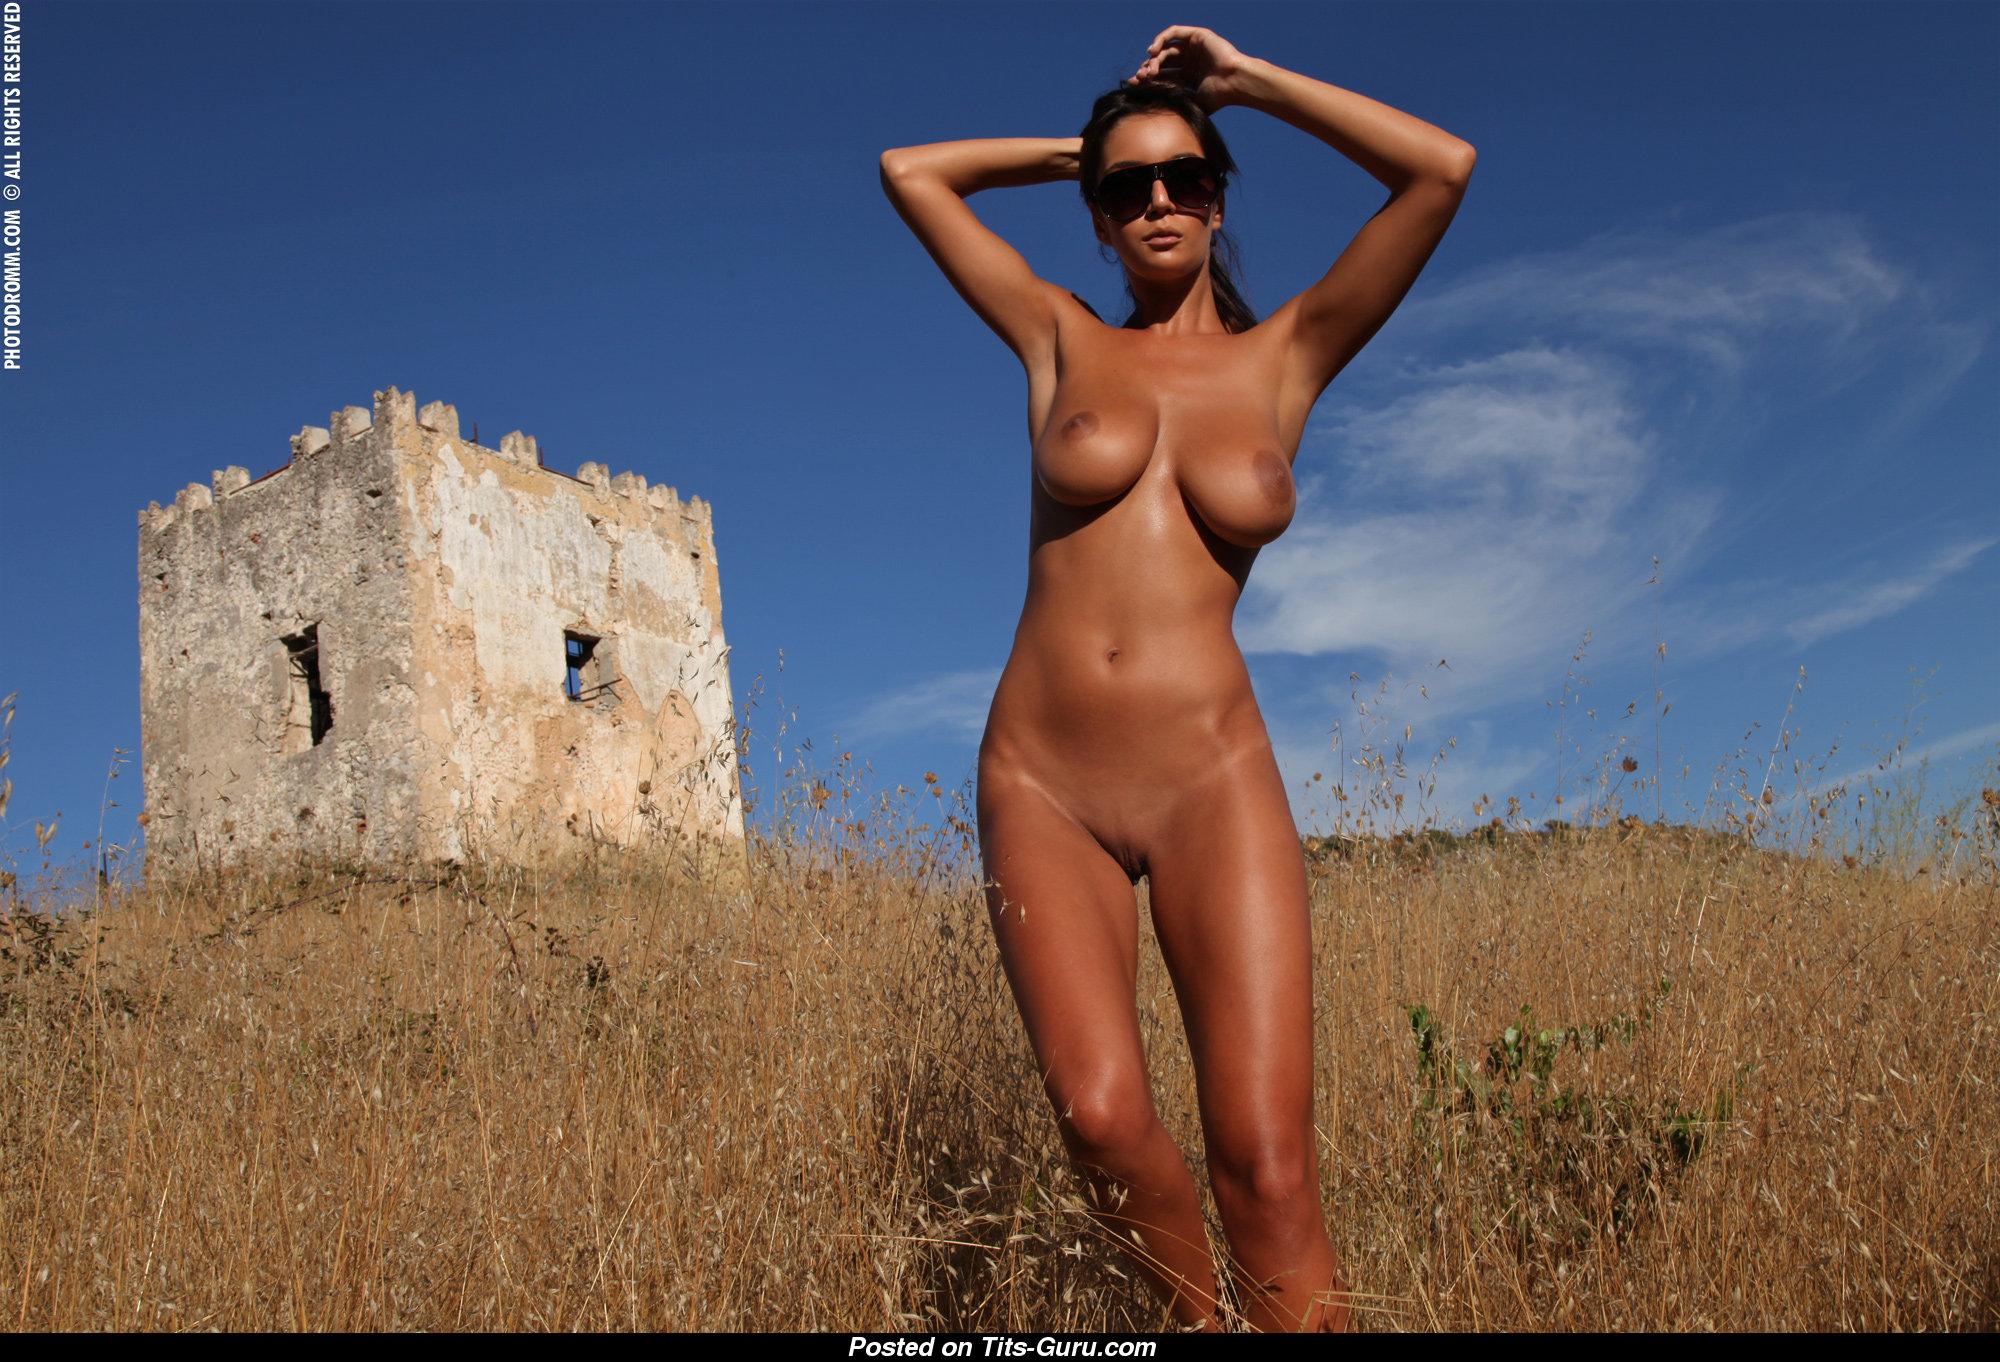 Ela Savanas - Stunning Lady with Hot Naked H Size Titty ...